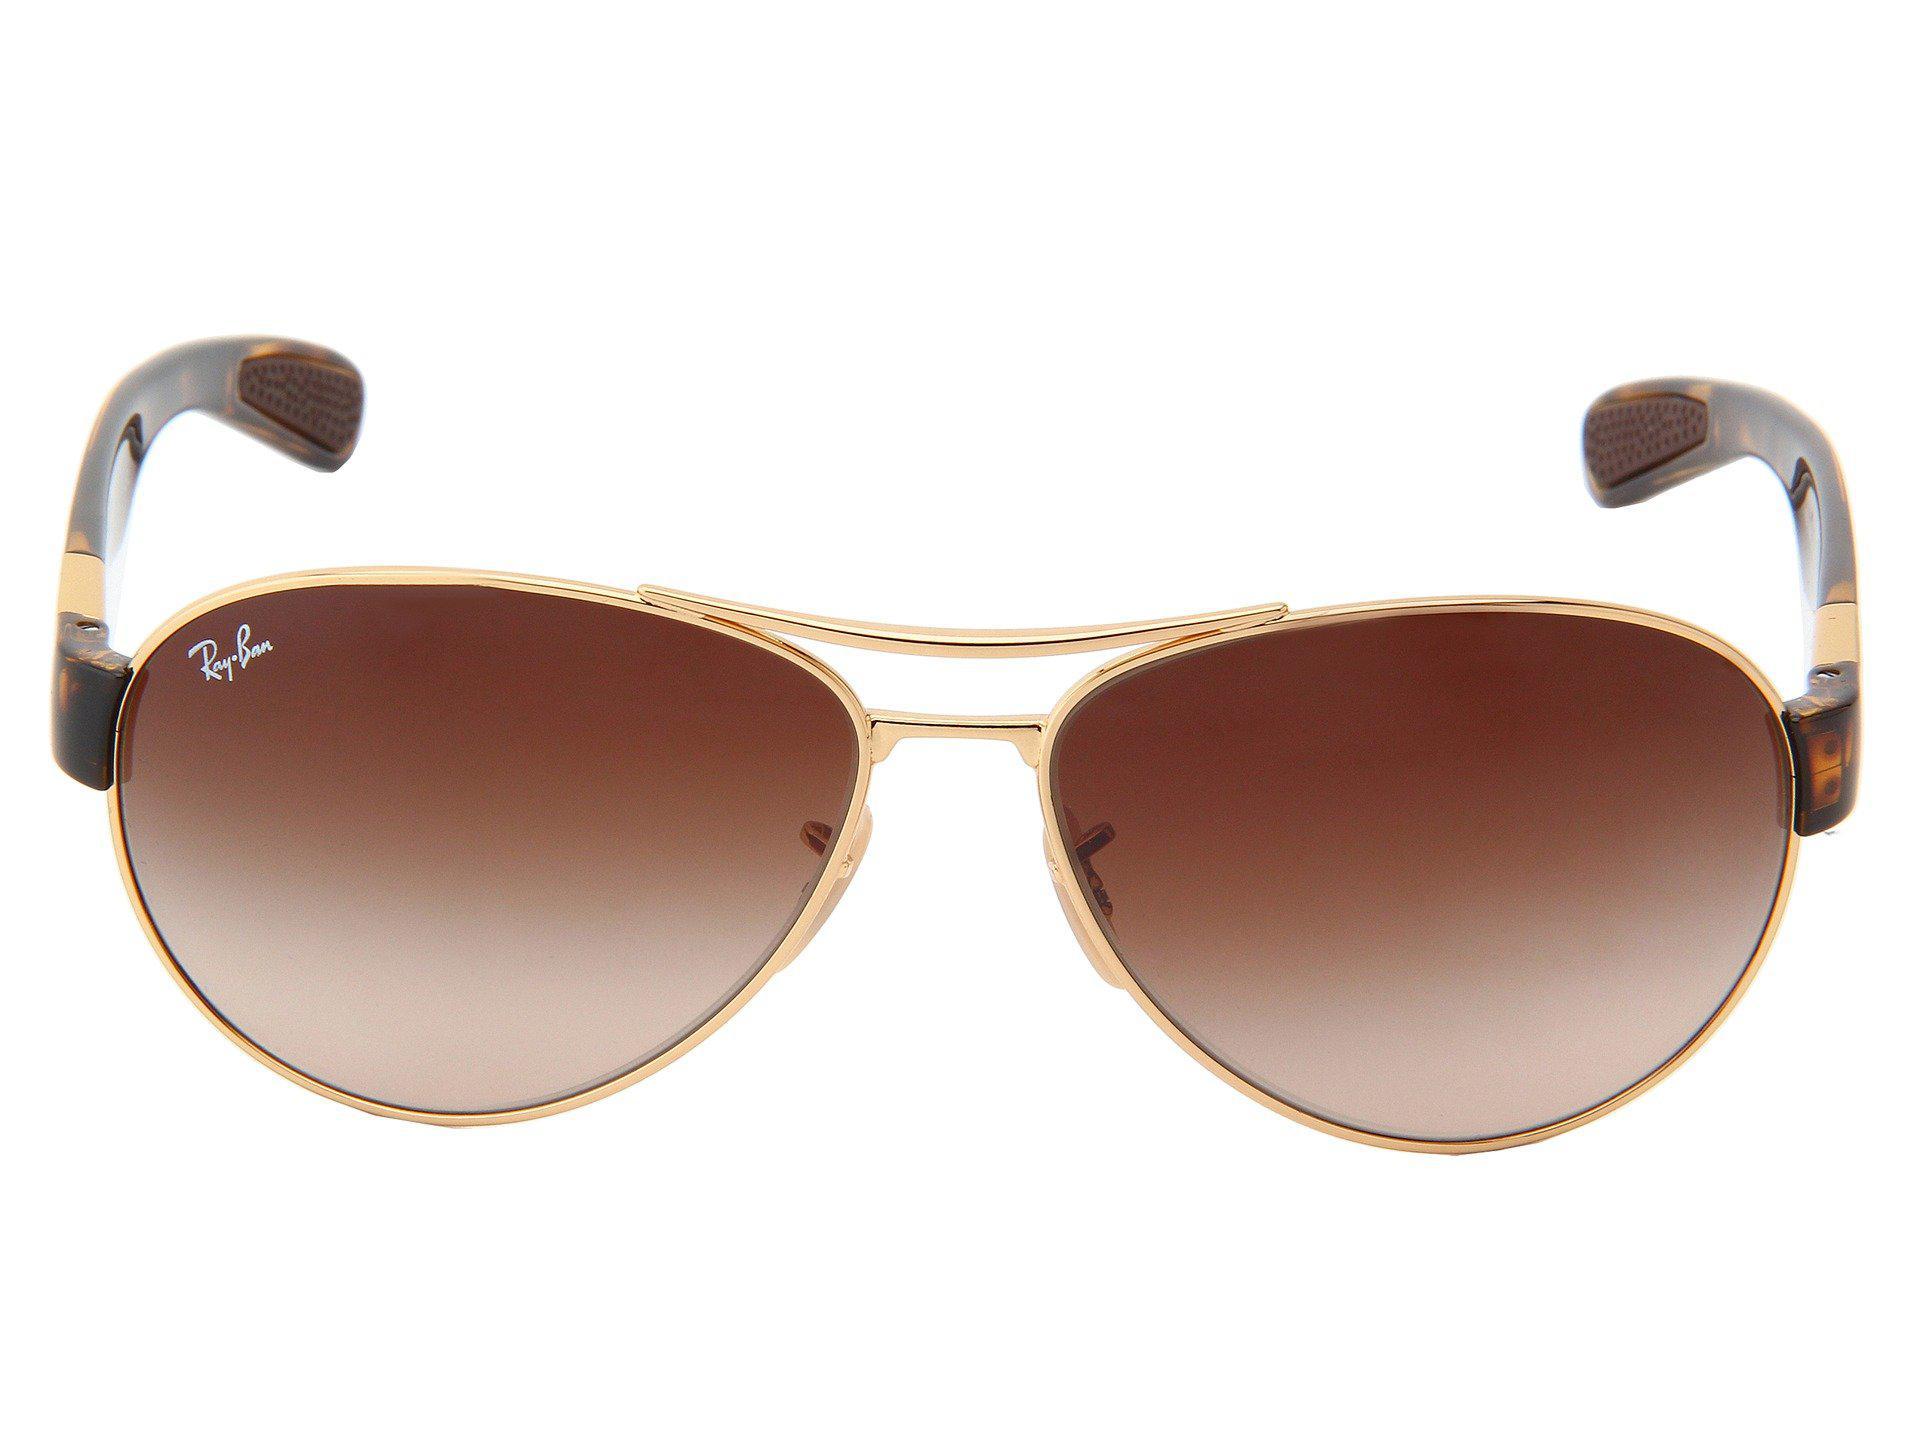 30ebe1c929 Ray-Ban - Brown Rb3509 63mm (gunmetal green) Fashion Sunglasses - Lyst.  View fullscreen